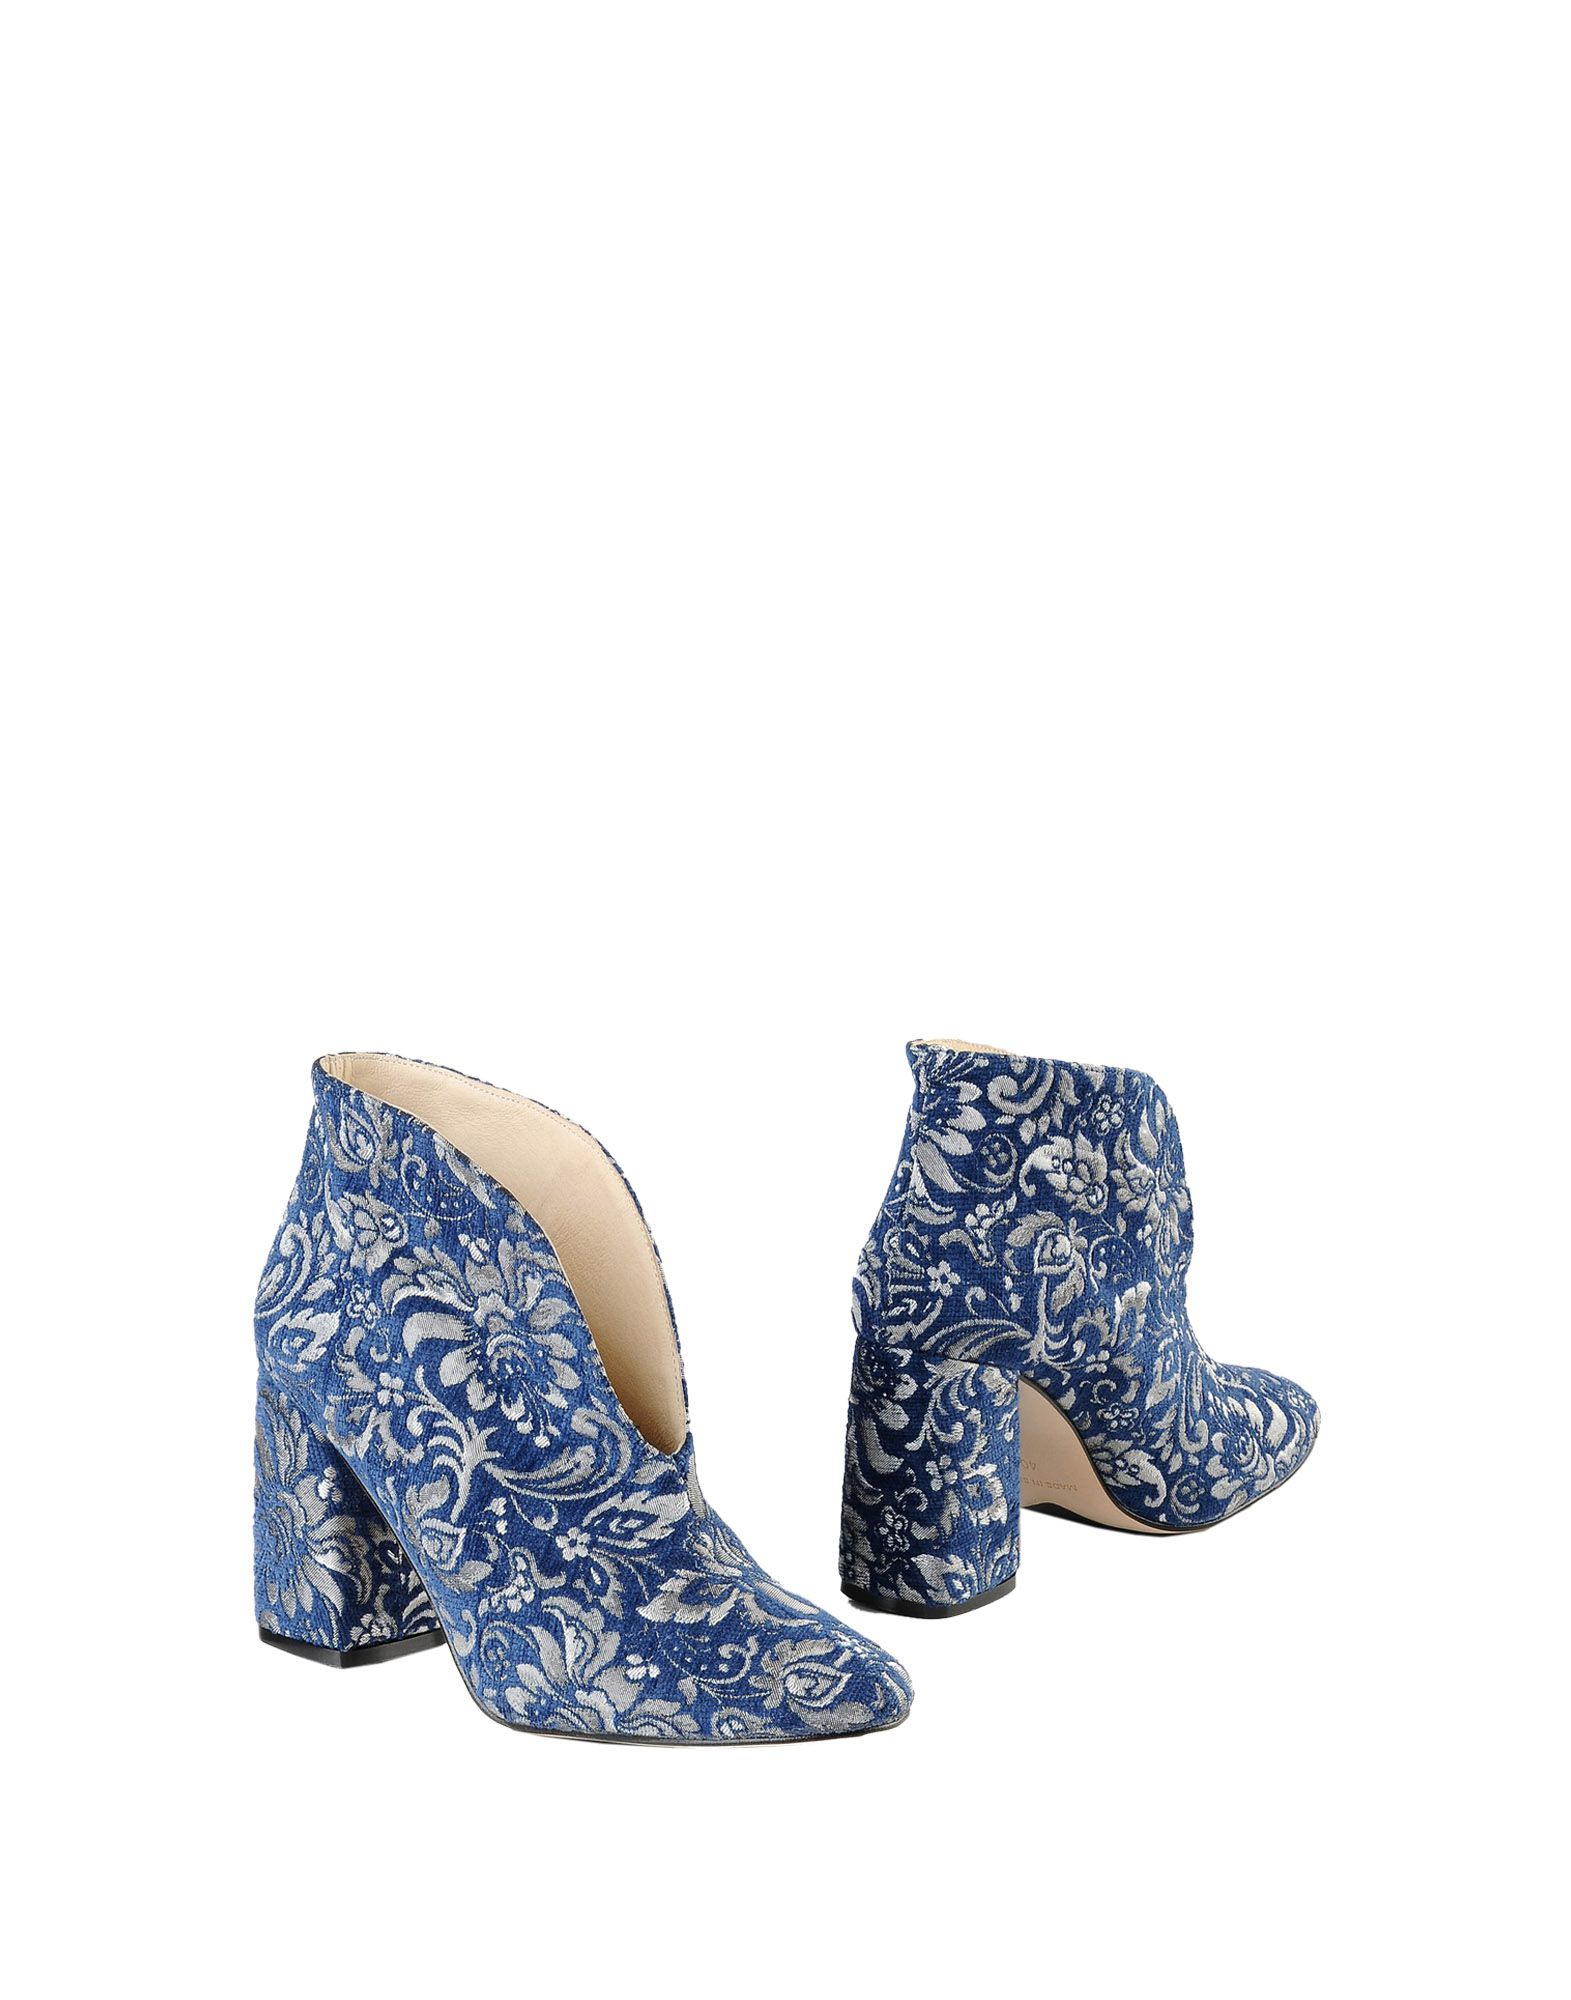 ФОТО george j. love Полусапоги и высокие ботинки